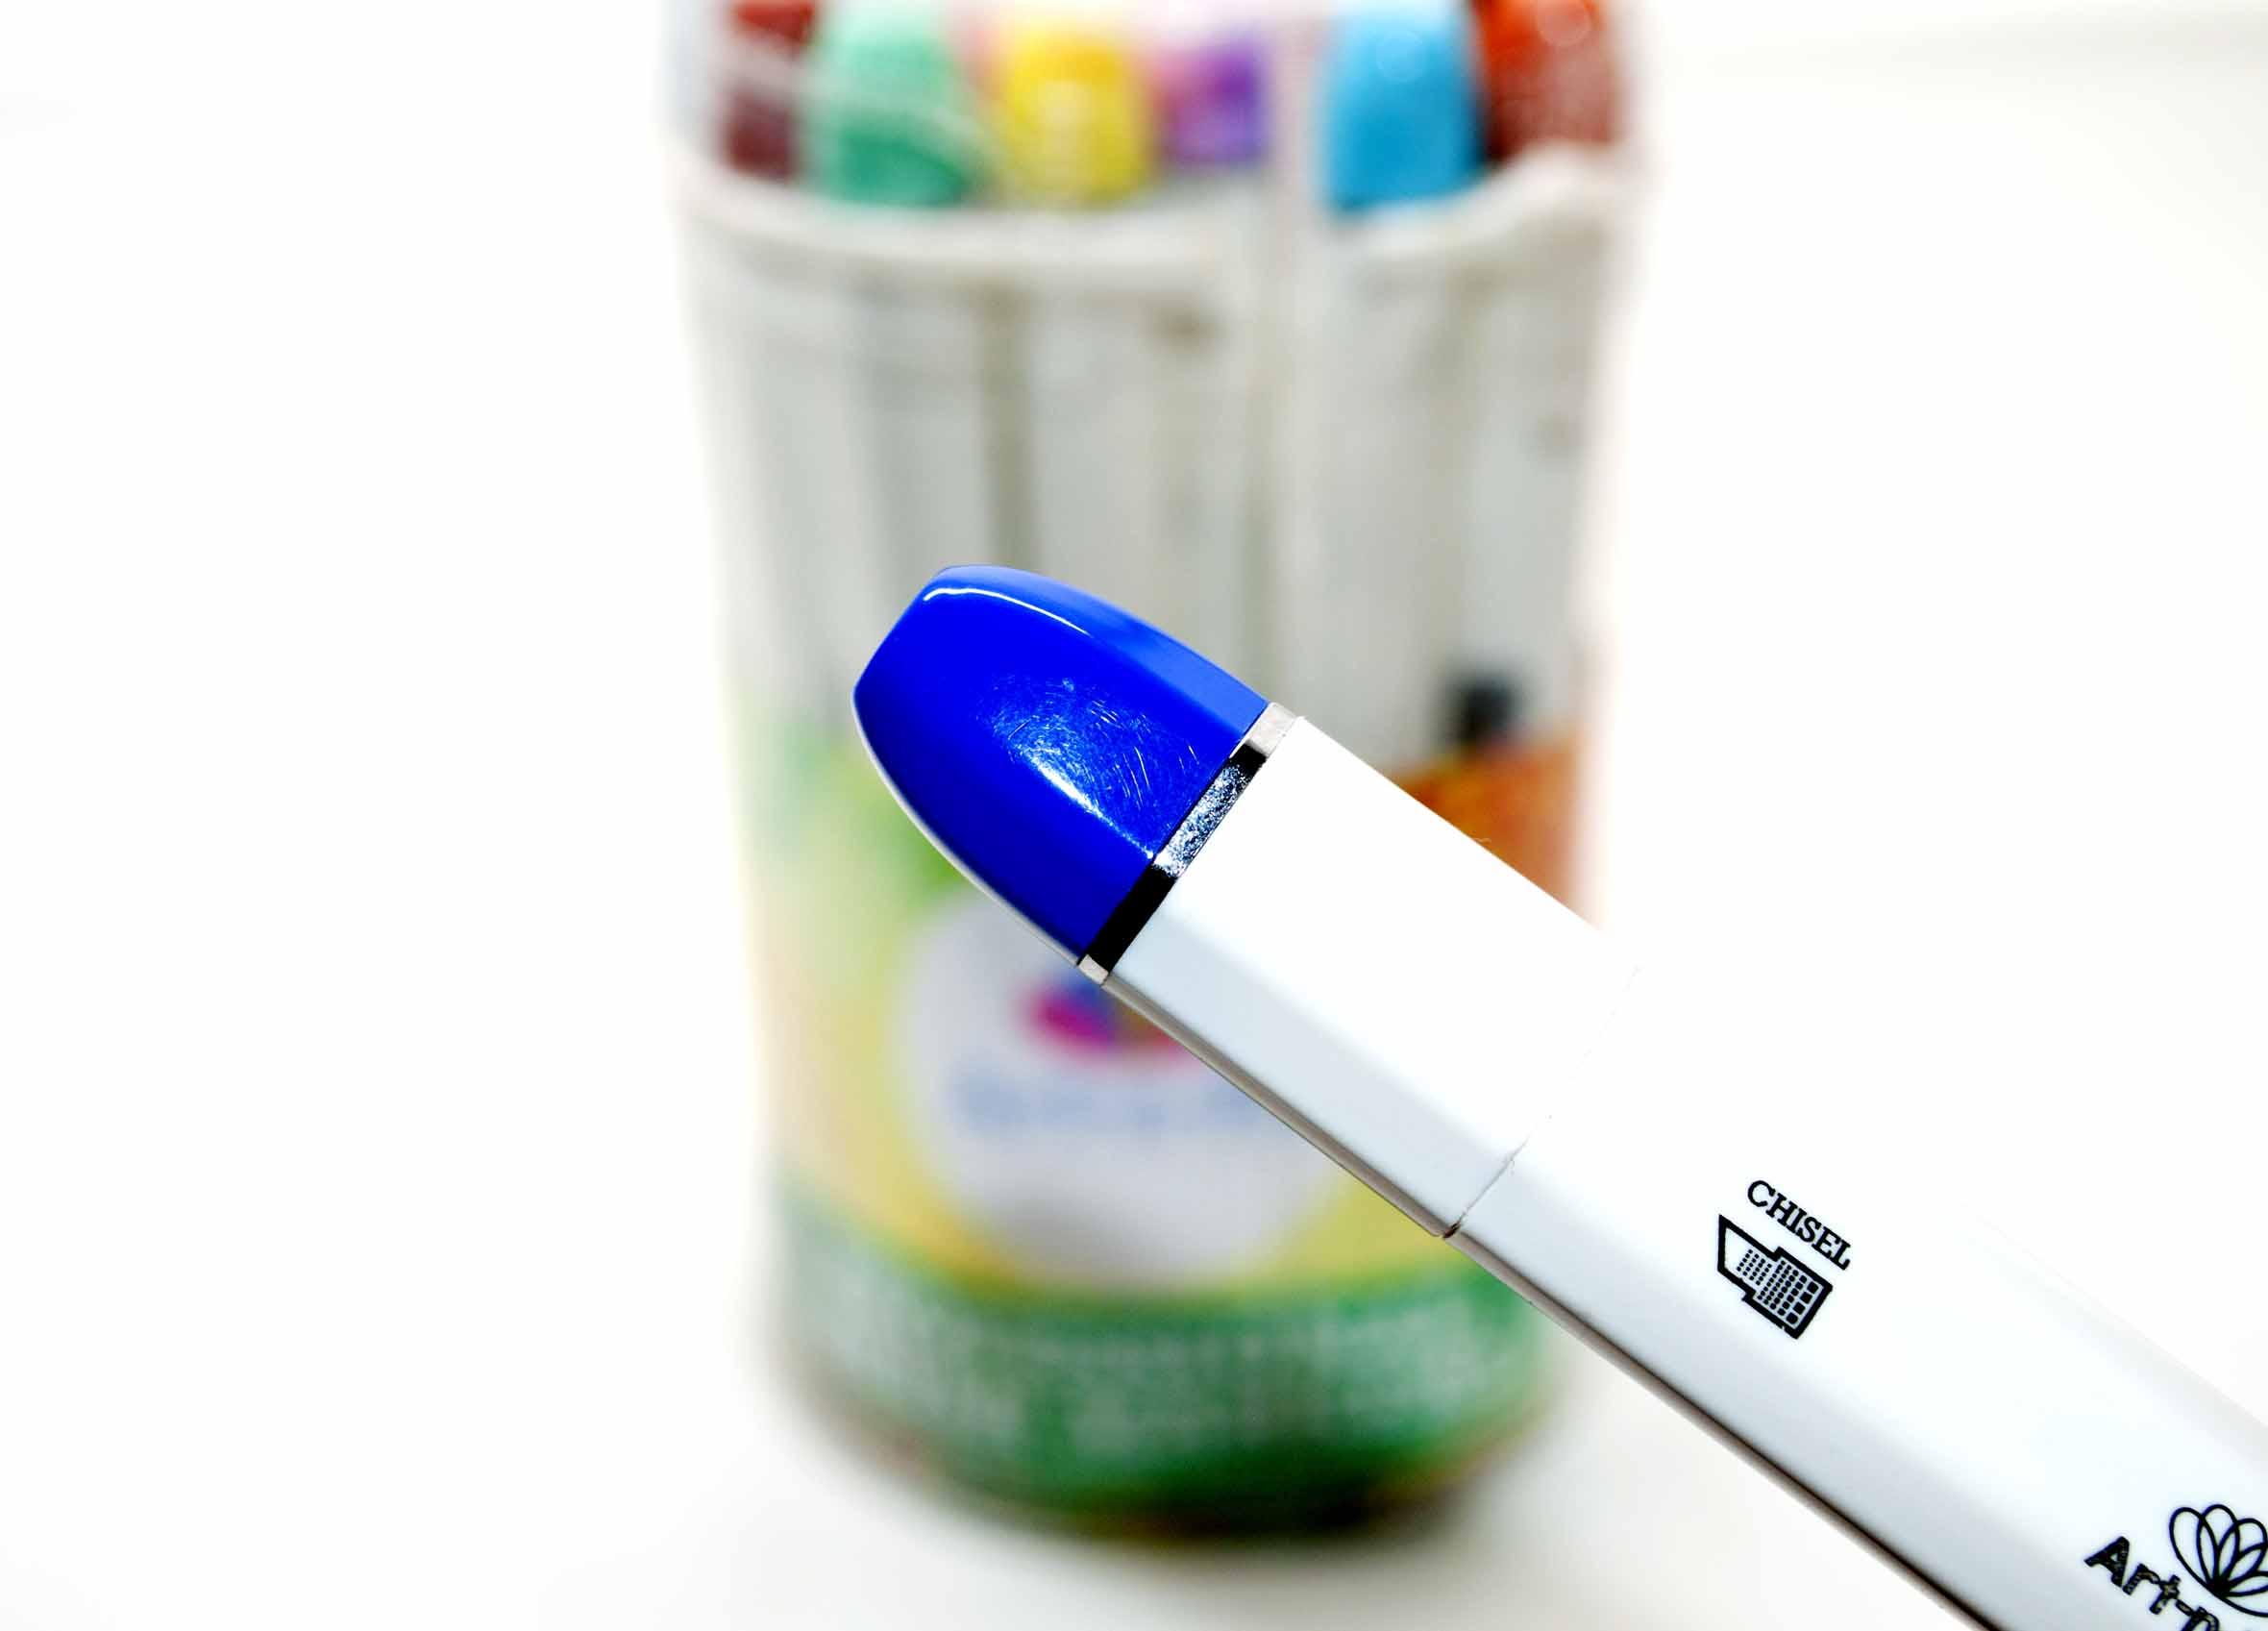 art-n-fly lid colours.jpg